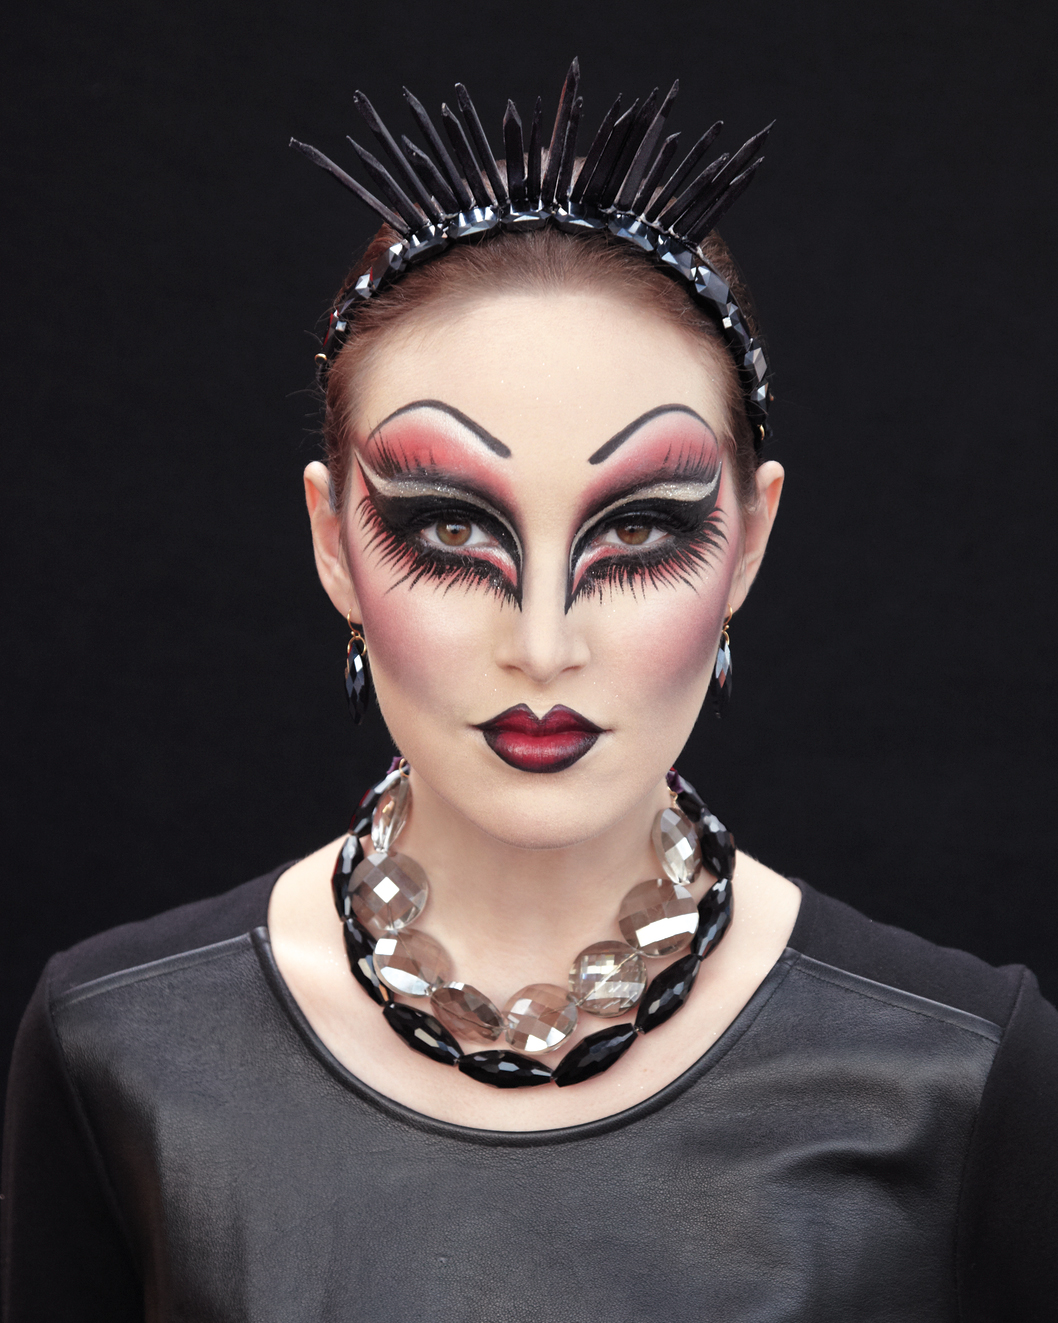 beauty-evil-1346-md109123.jpg